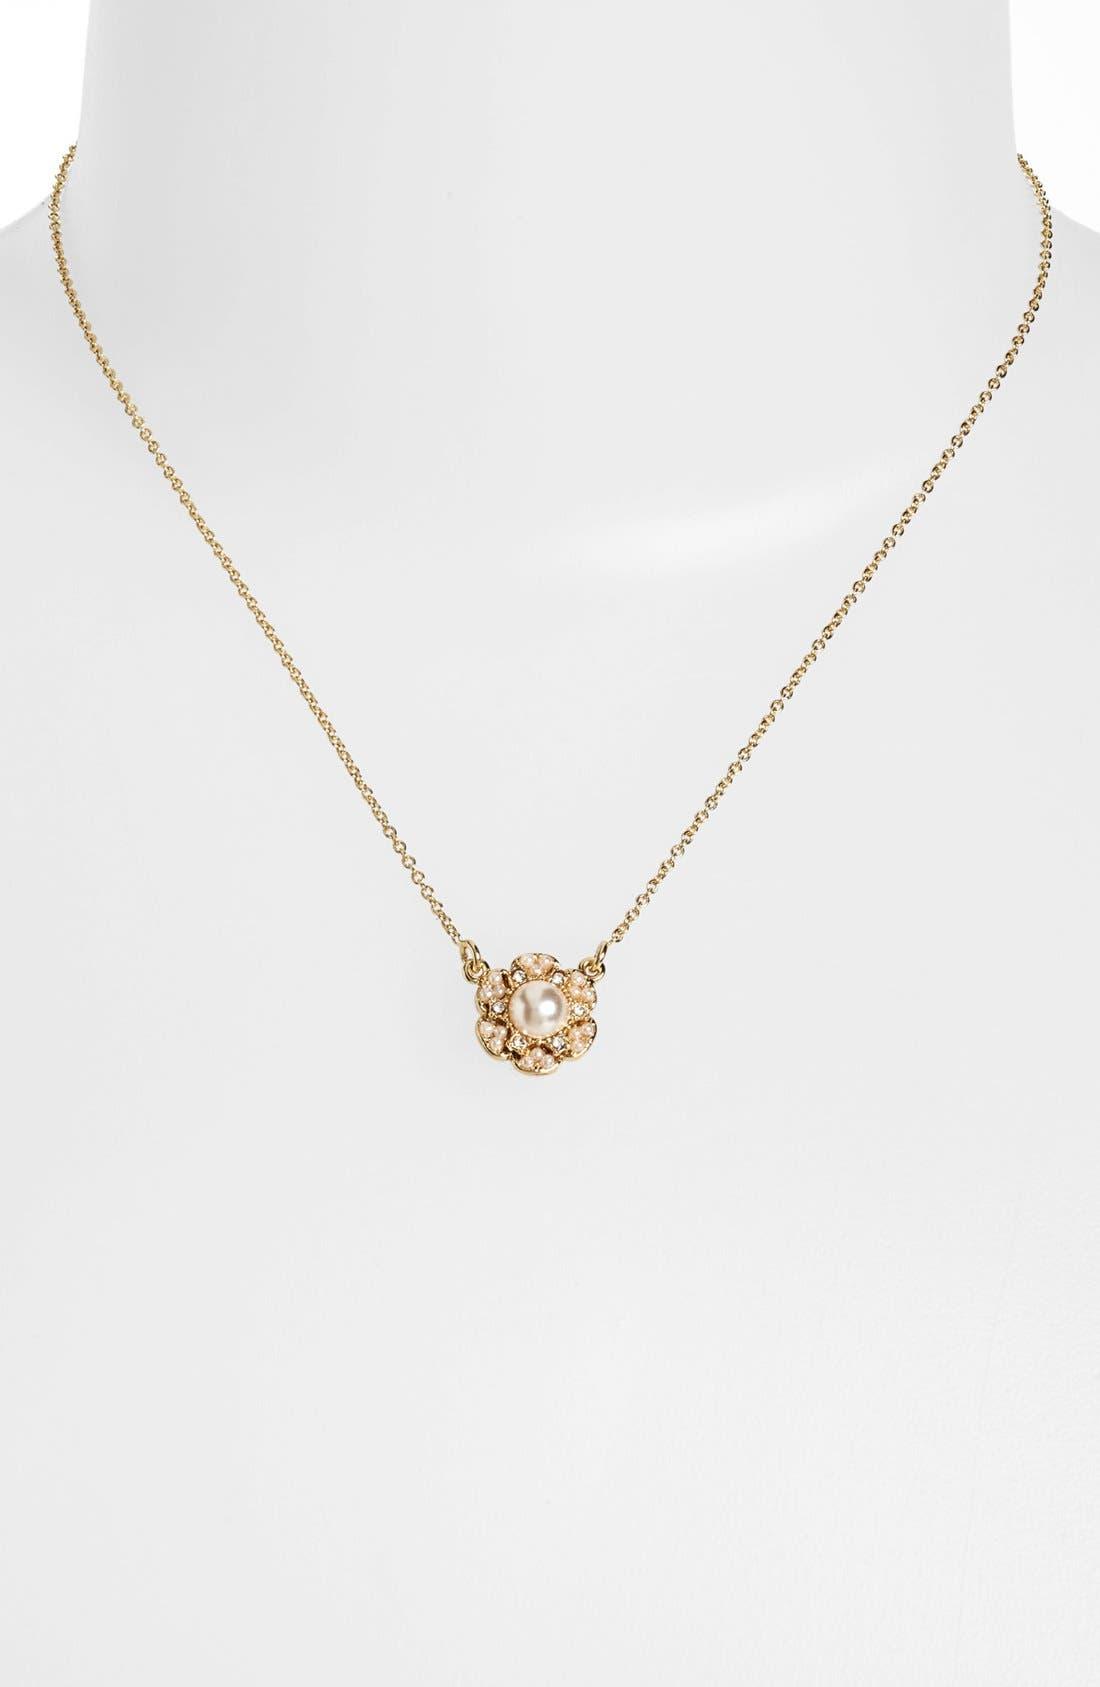 Main Image - kate spade new york 'park floral' pendant necklace